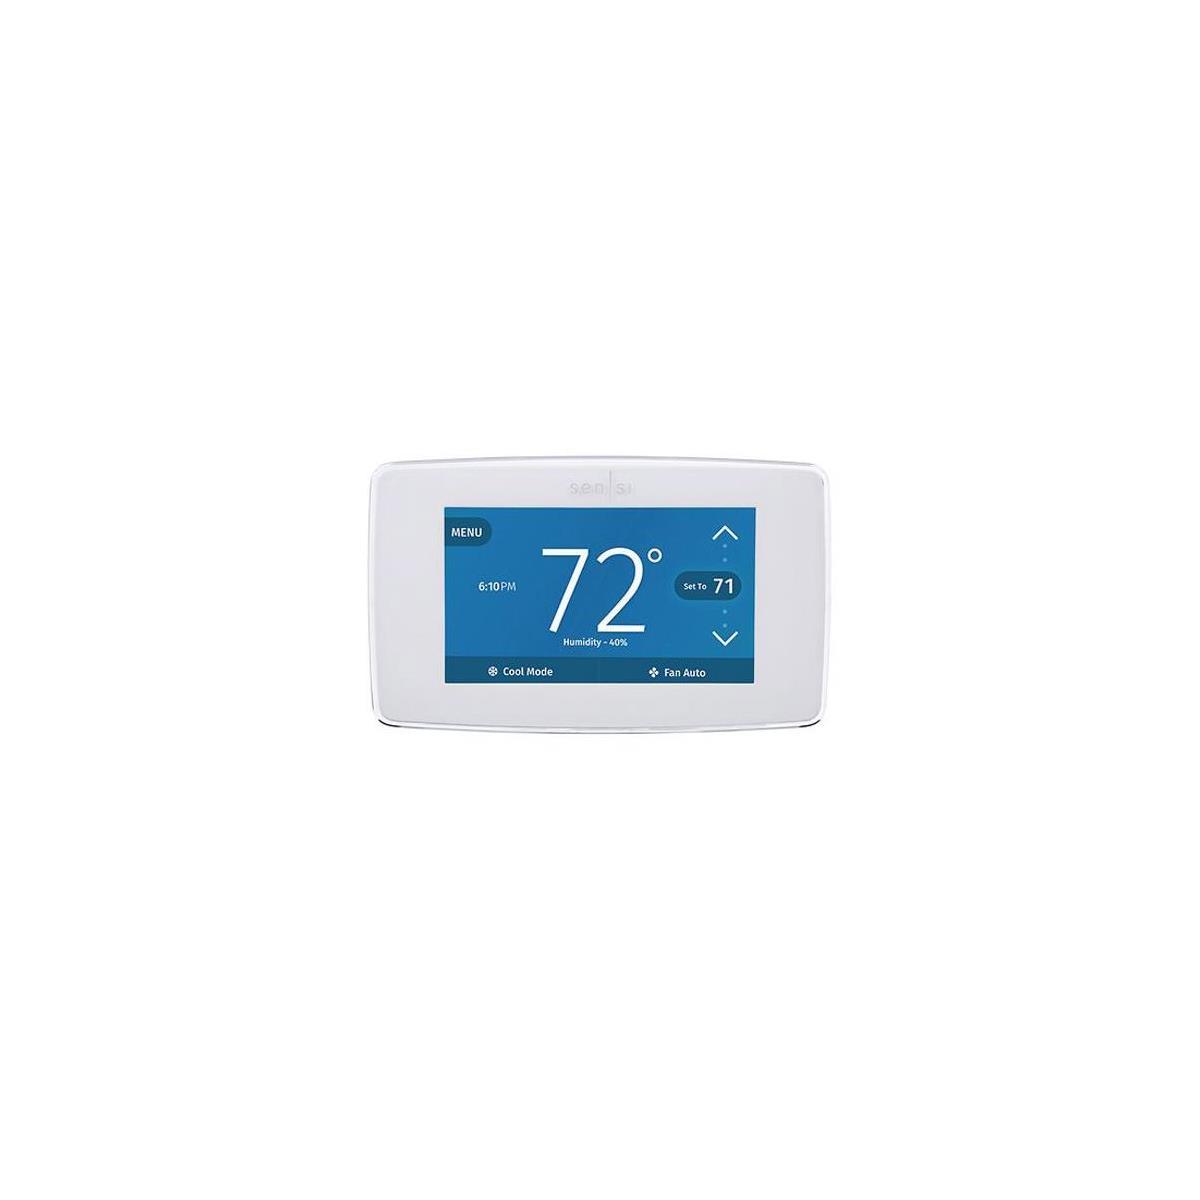 Emerson Electric Sensi Touch Wi-Fi Smart Thermostat, White